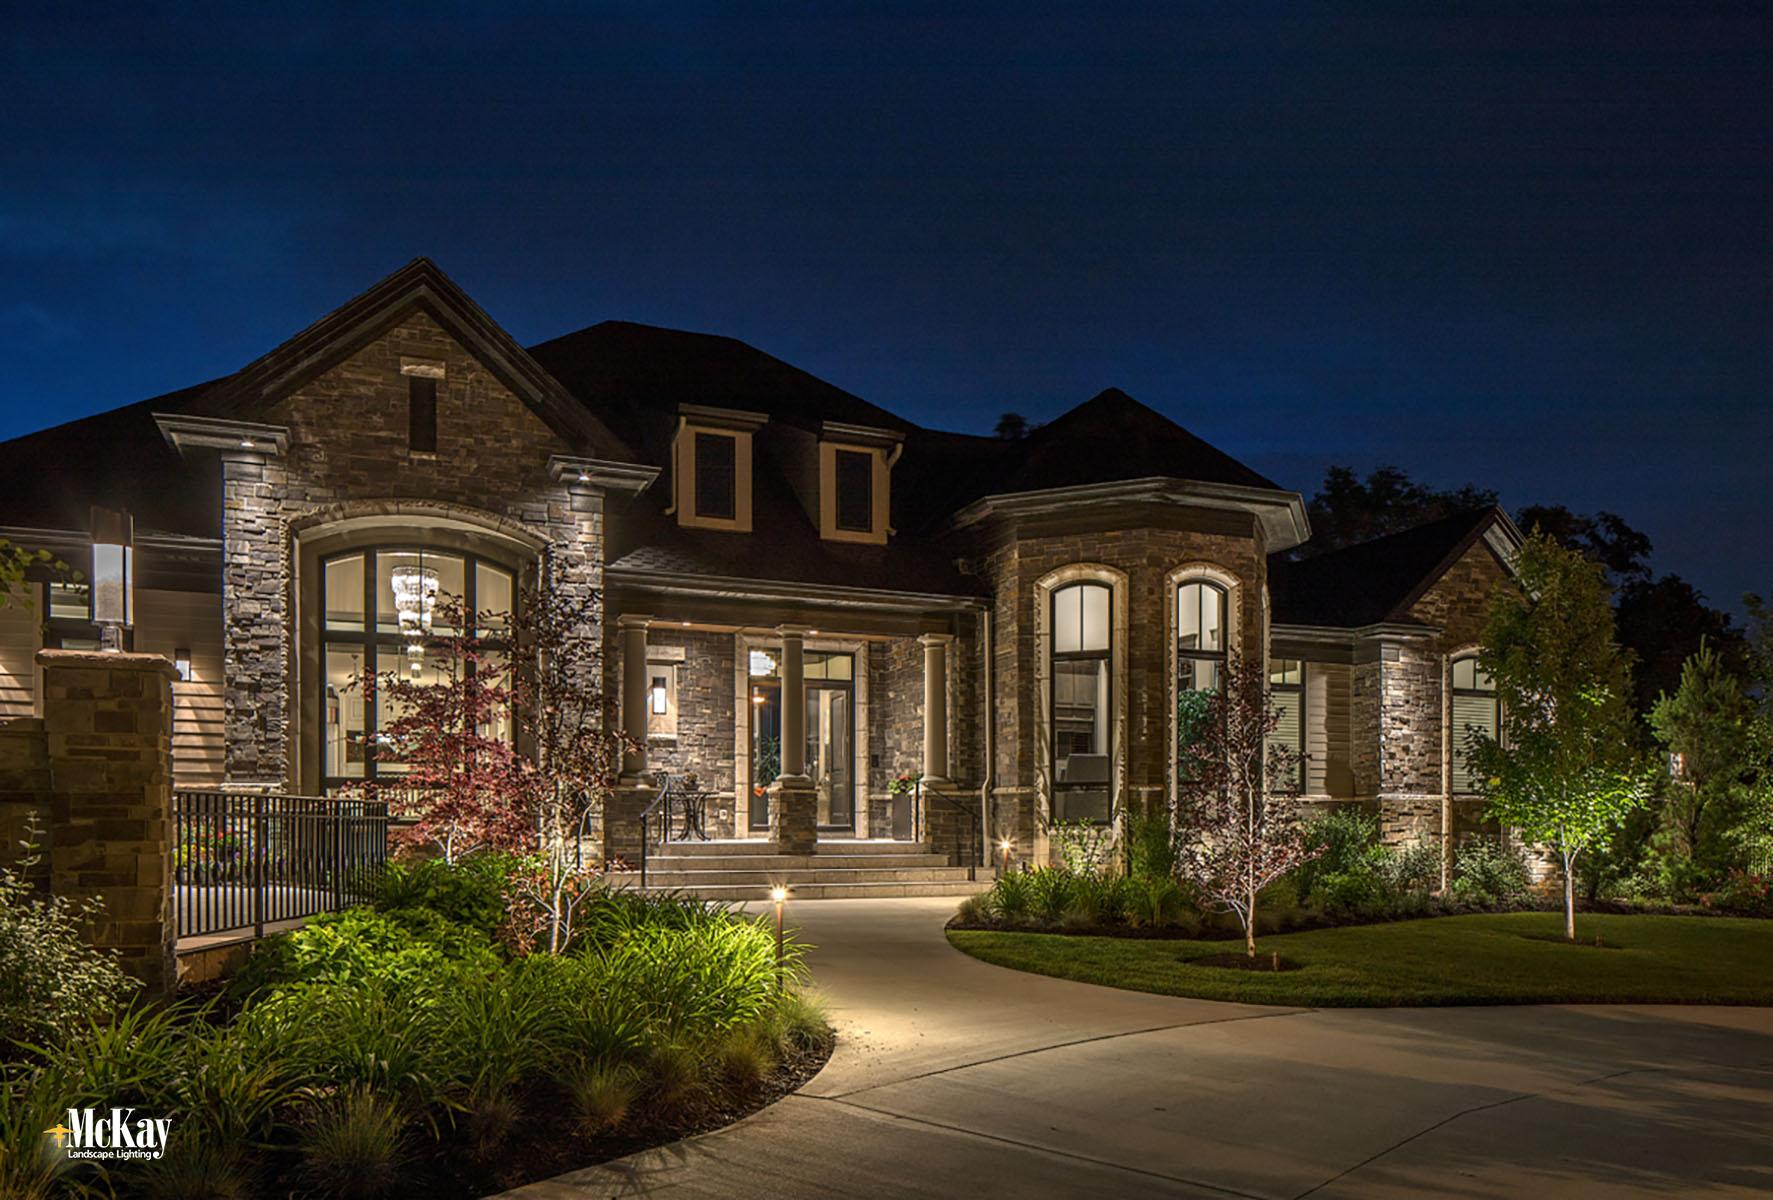 Low Voltage Landscape Lighting Design:  Outdoor Security Lighting Elkhorn Nebraska | McKay Landscape Lighting